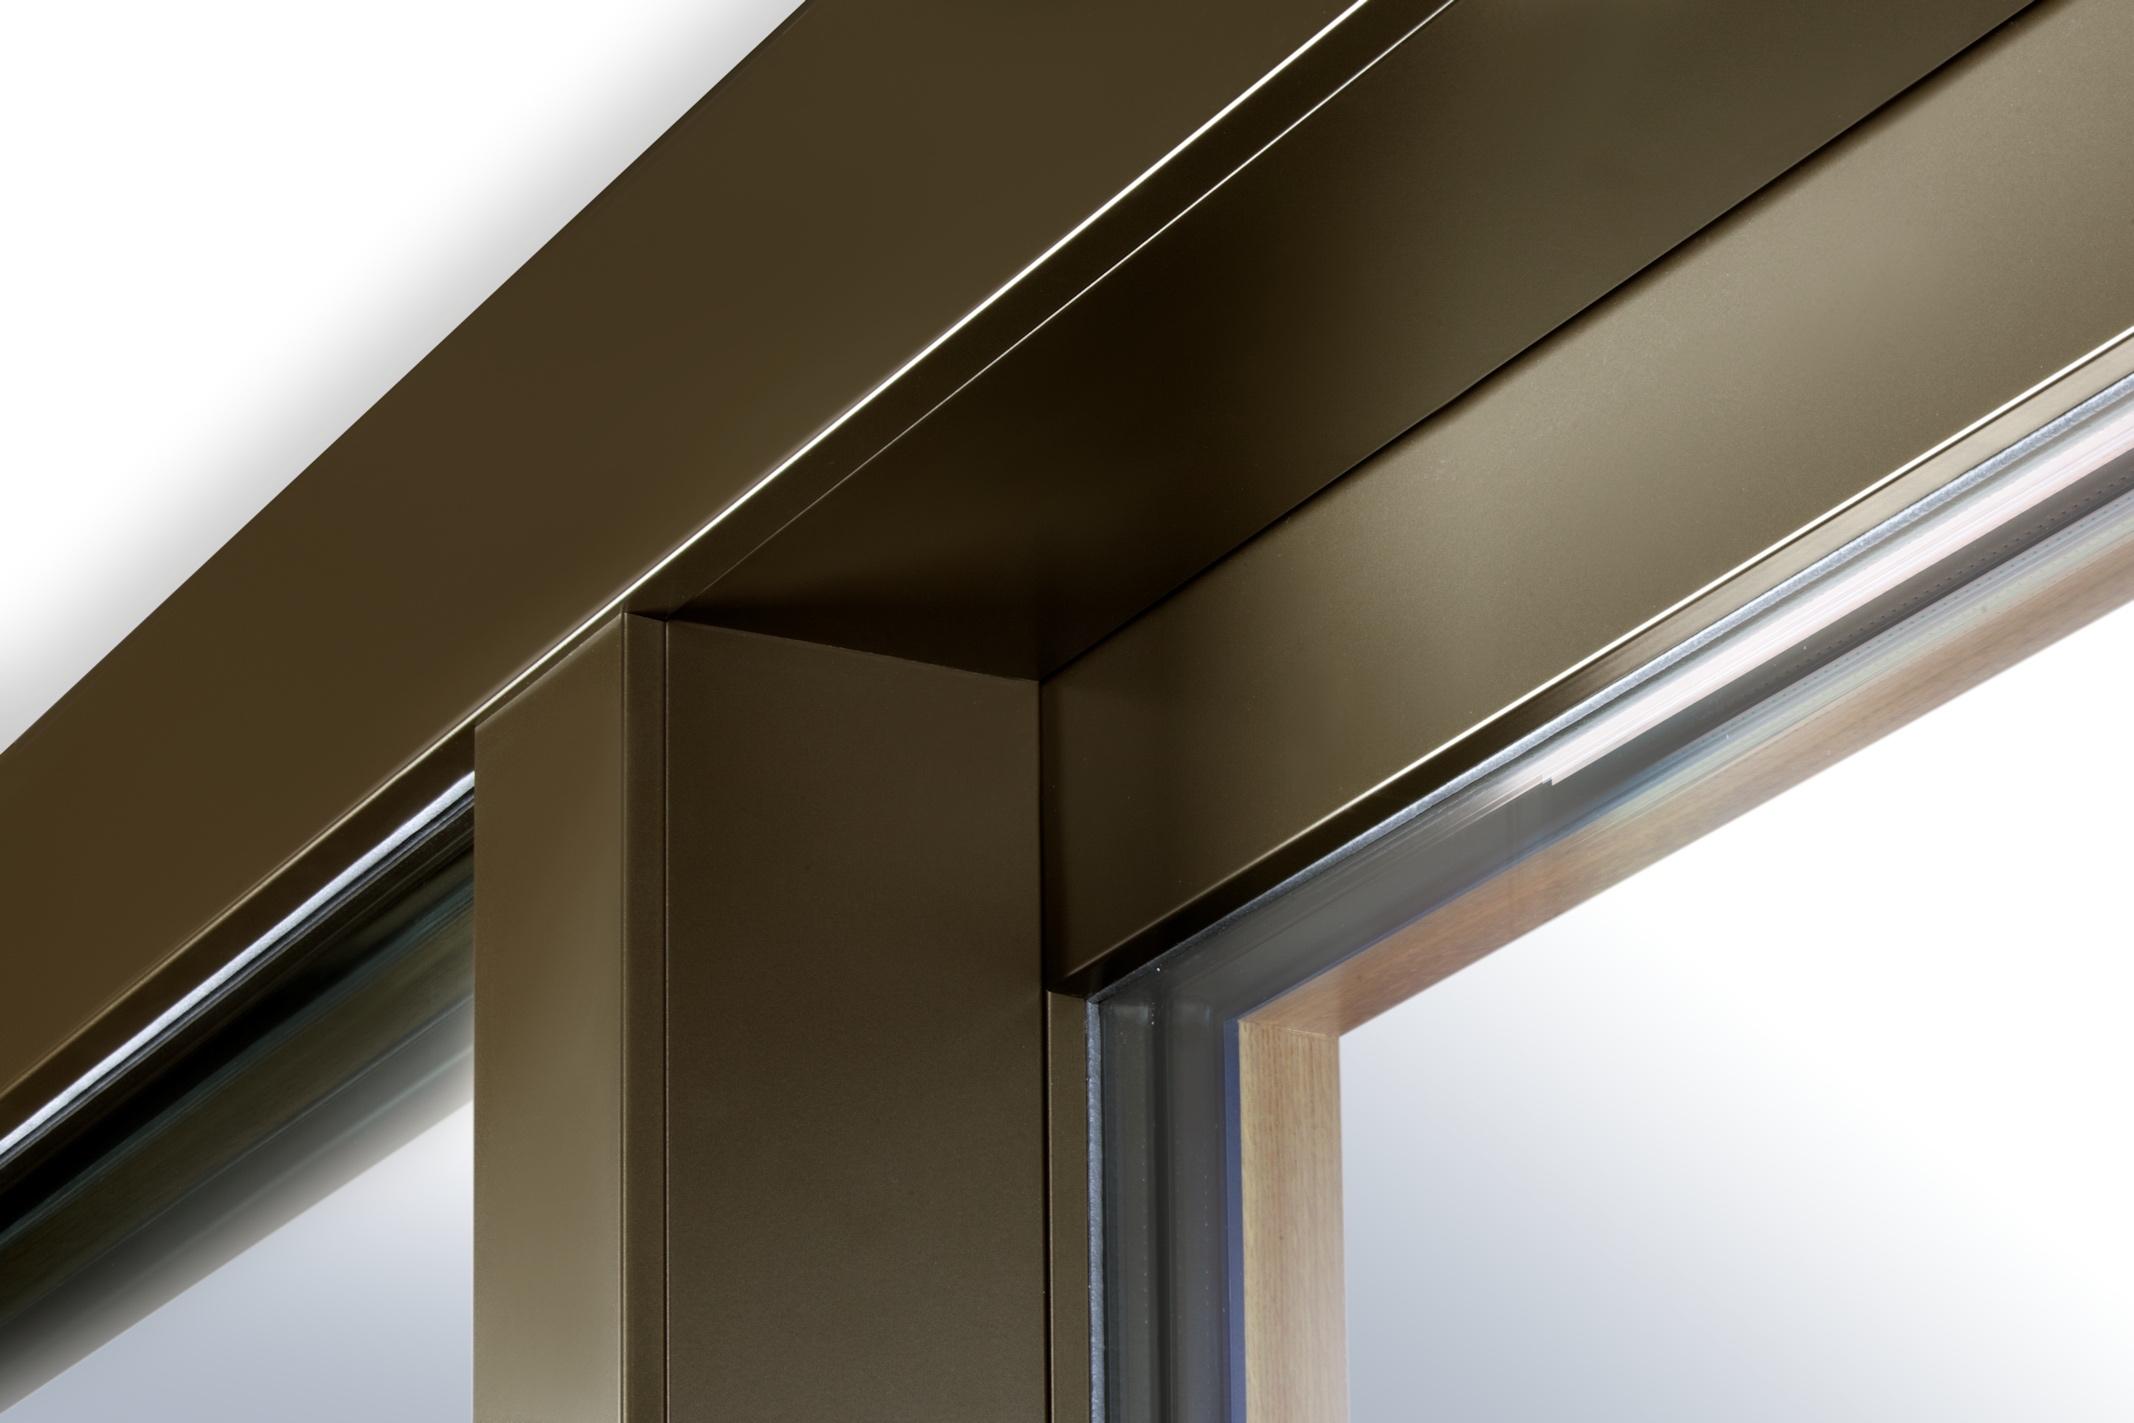 aluminium holz fenster hinterl ftung ist ein muss fenster baustoffwissen. Black Bedroom Furniture Sets. Home Design Ideas